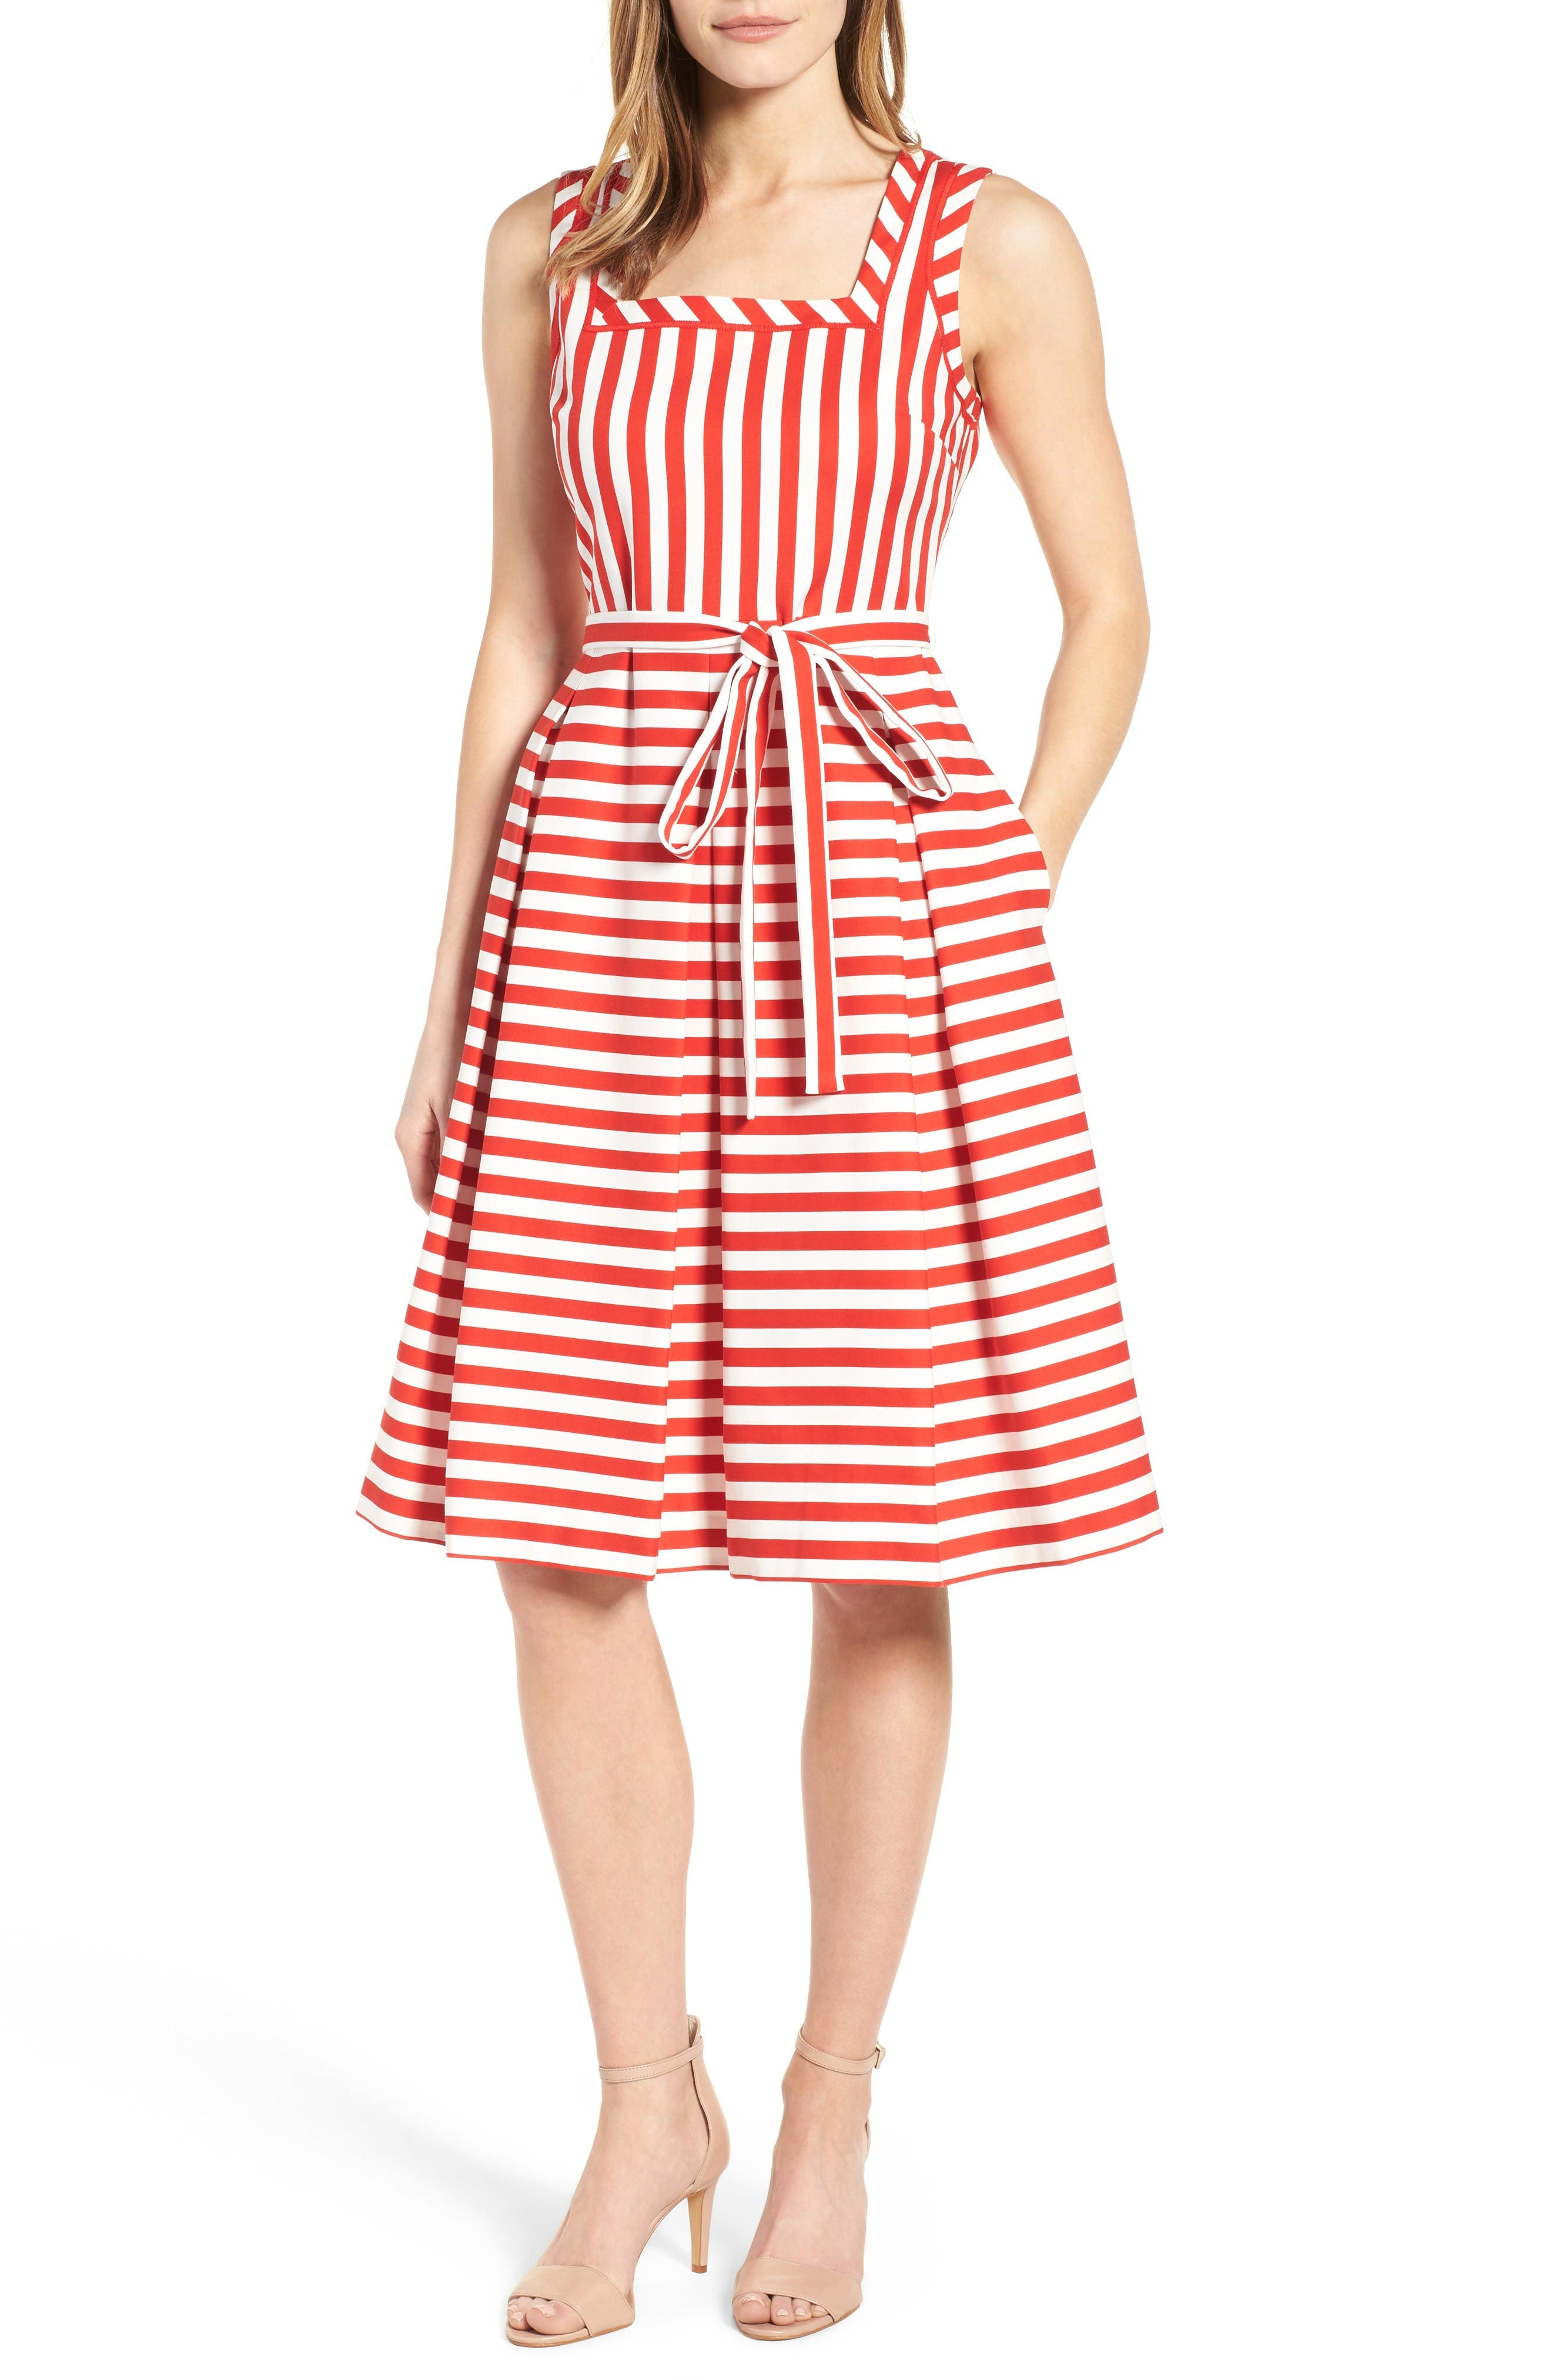 Alternate Image 1 Selected - Anne Klein Stripe Fit & Flare Dress